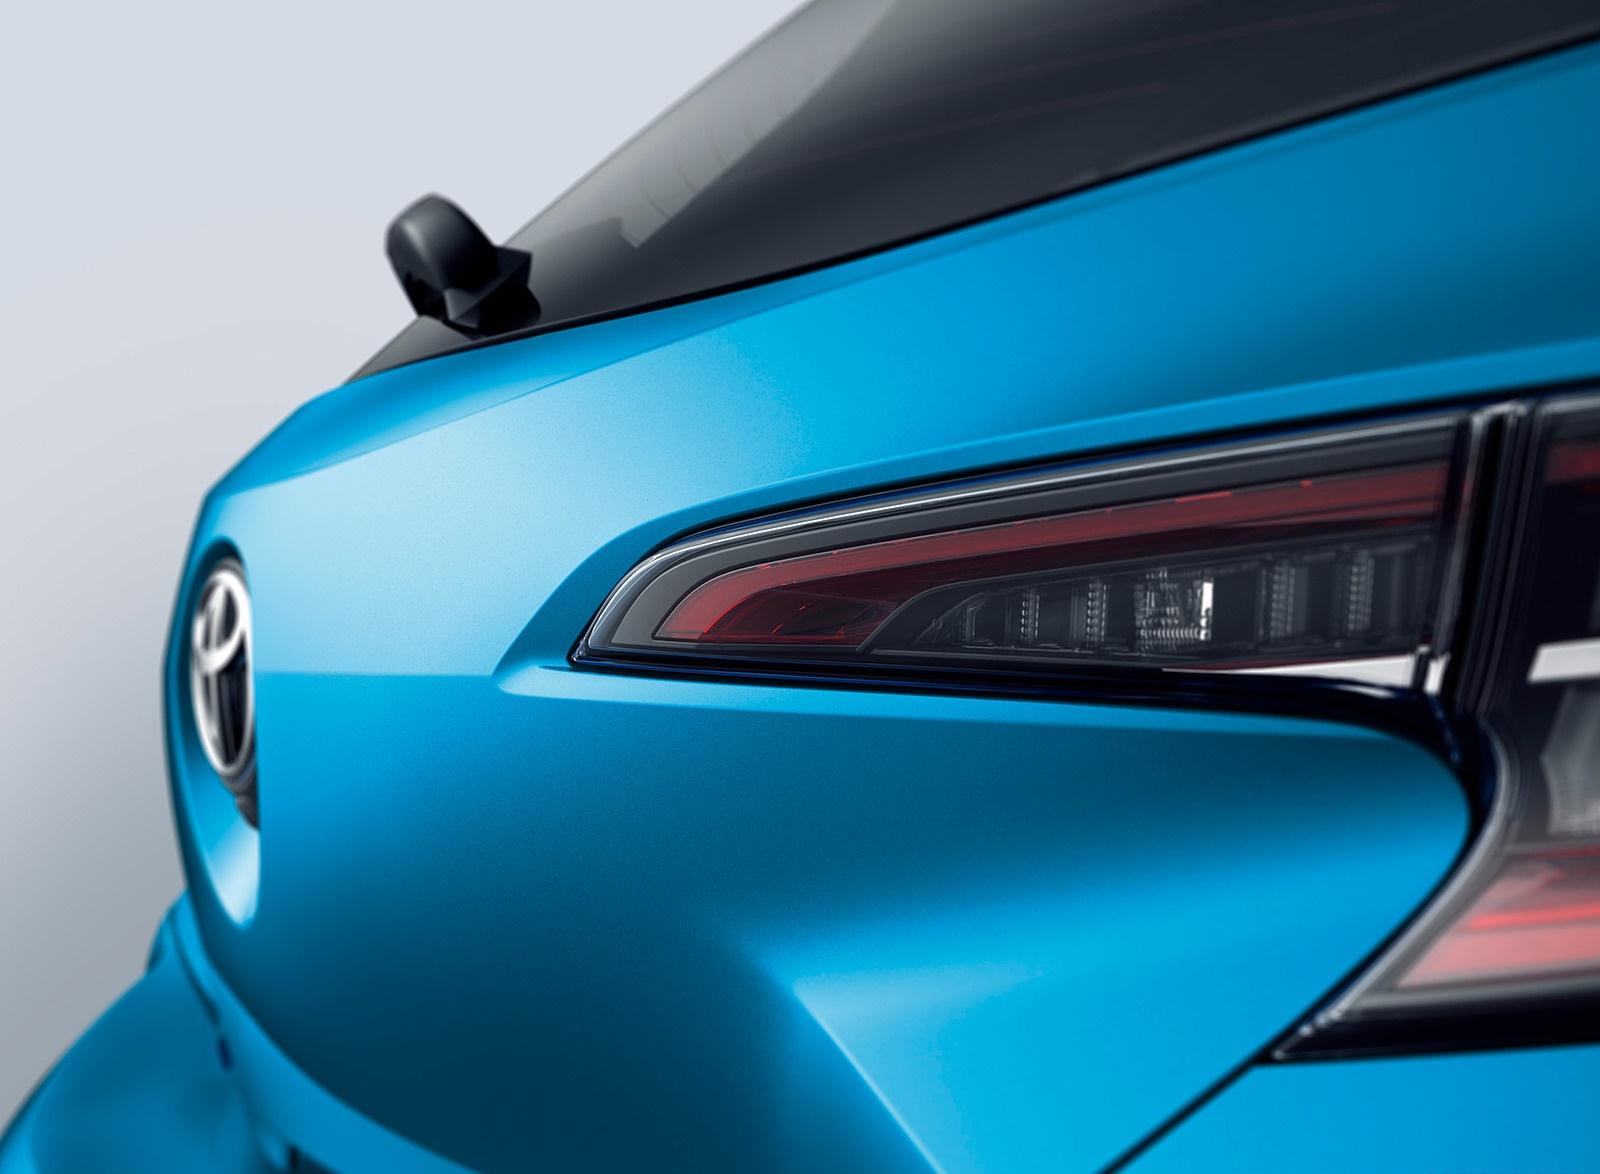 2019 Toyota Corolla Hatchback Detail Wallpaper (14)